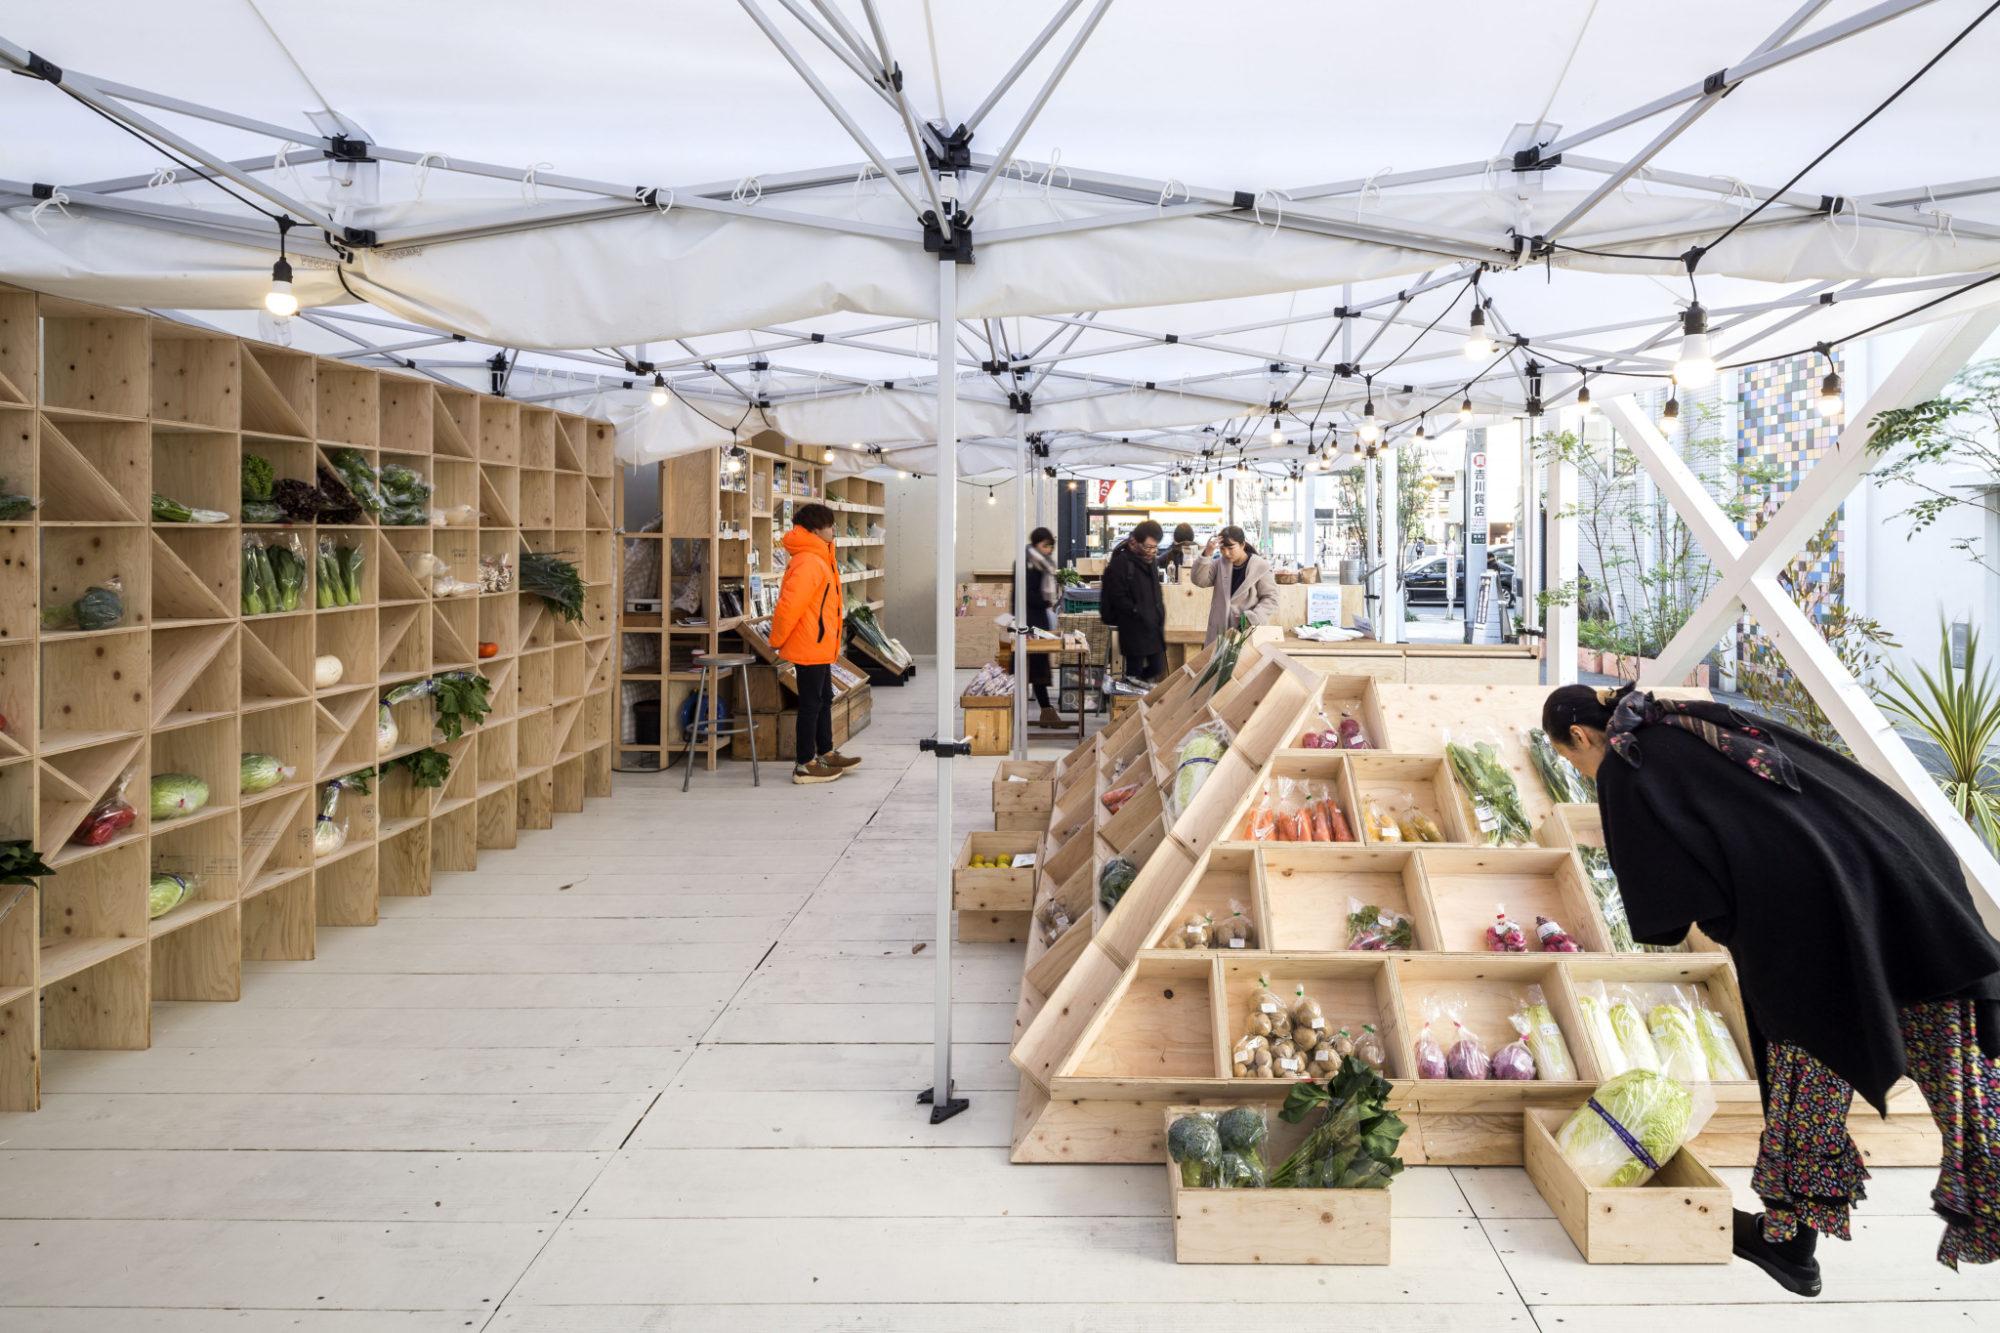 Commune Farmers Market Omotesando 表参道 ファーマーズマーケット コミューン Mosaic Design Ko Nakamura 中村航